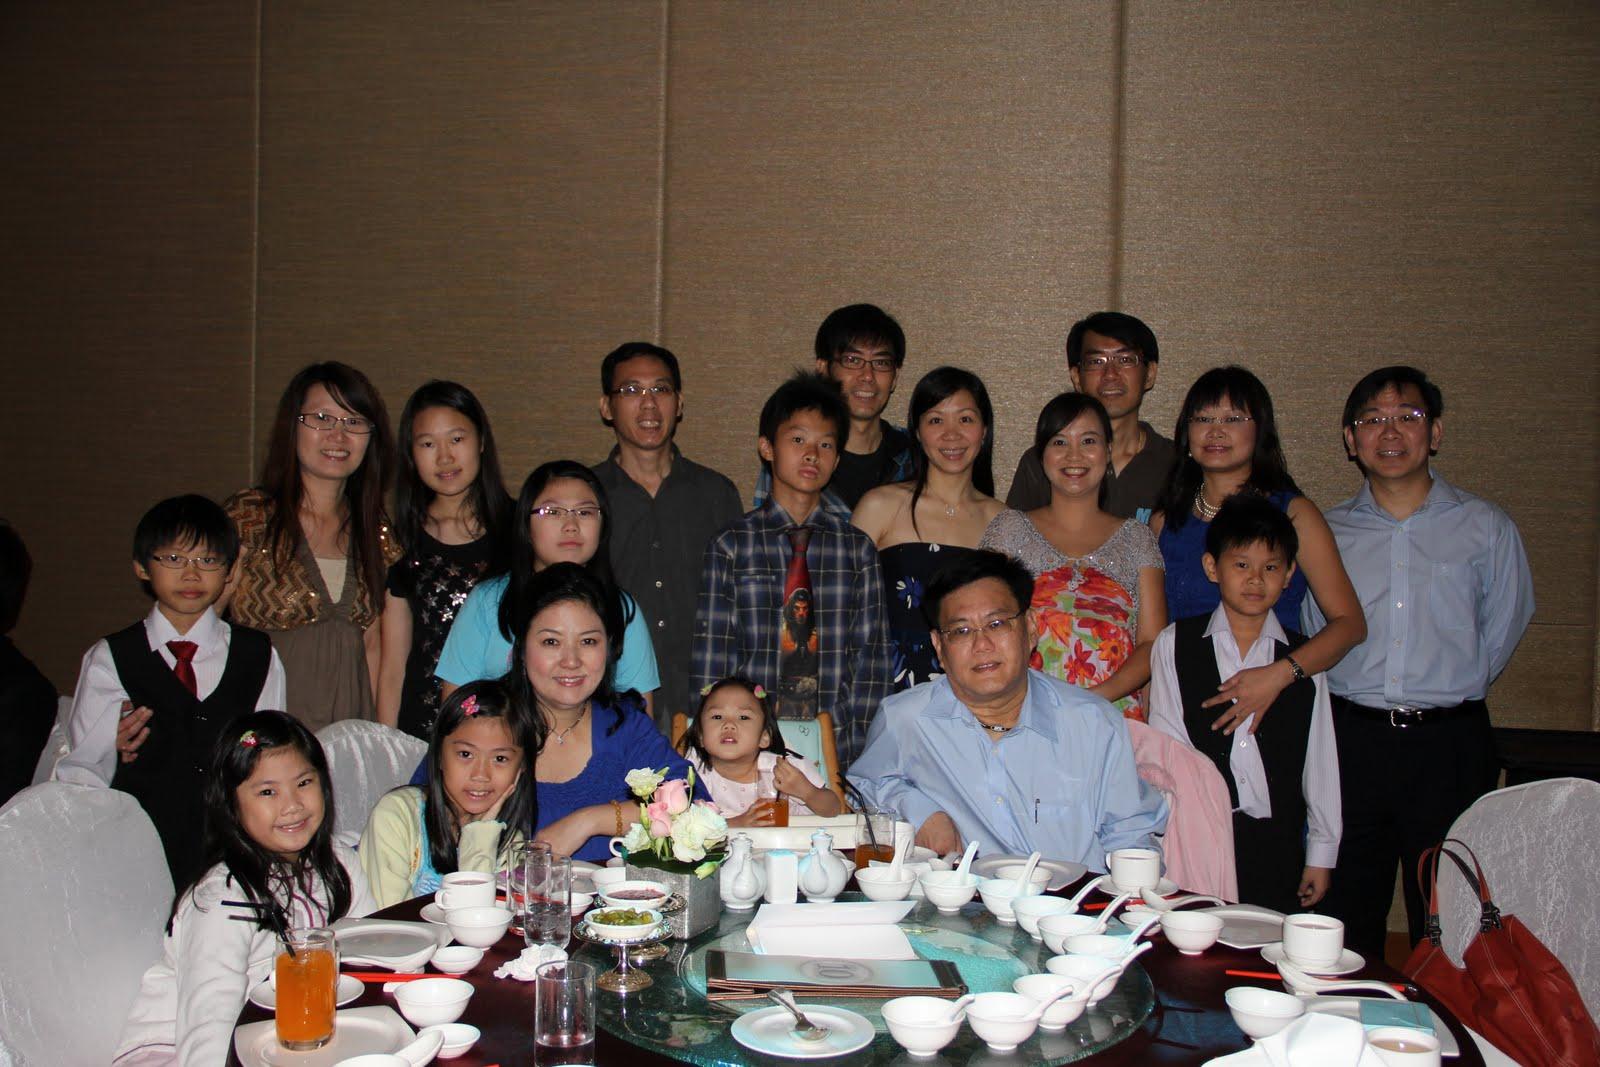 Tan Family Chronicles: My Cousin Emmeline's wedding